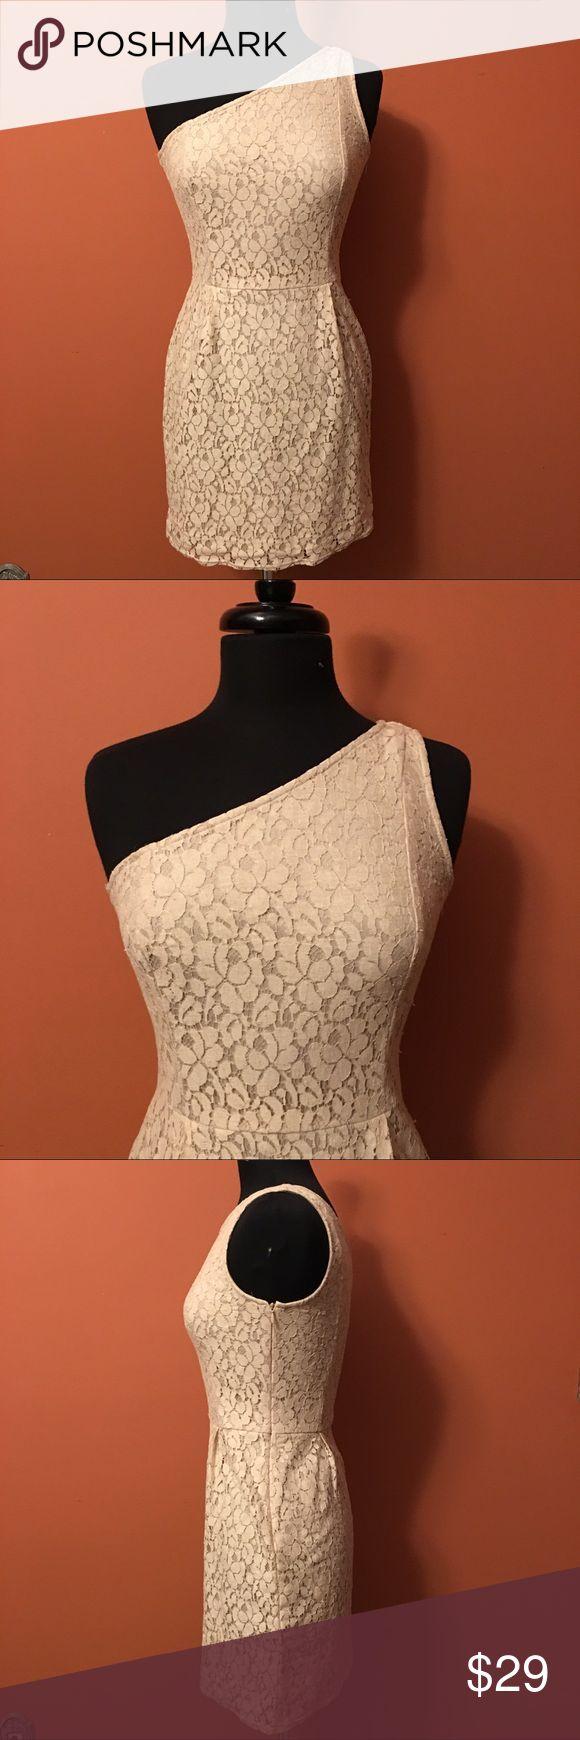 W118 by Walter Baker One Shoulder Lace Dress Size XS, in great condition, one shoulder Lace Dress with side zipper W118 by Walter Baker Dresses One Shoulder